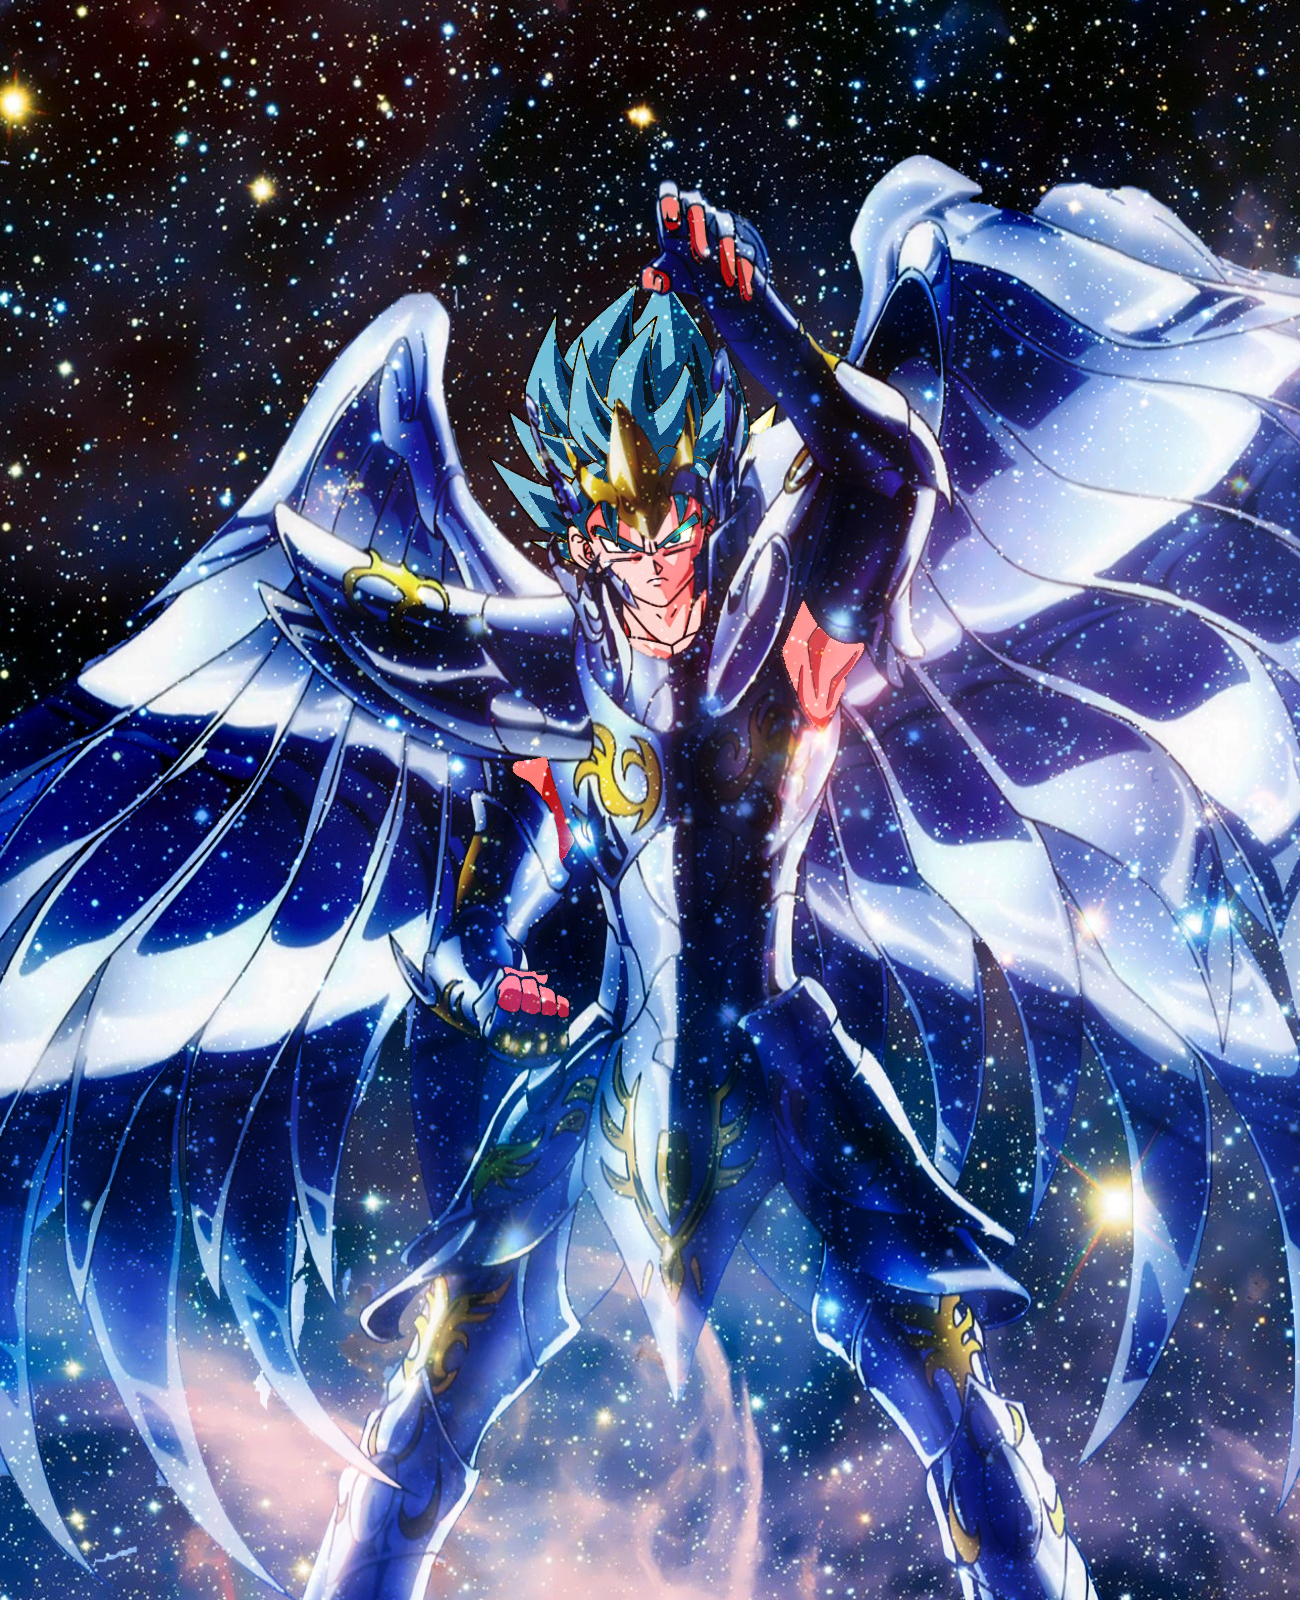 Goku super saiyan god omnipotent by shuma3 on deviantart - Foto goku super saiyan god ...